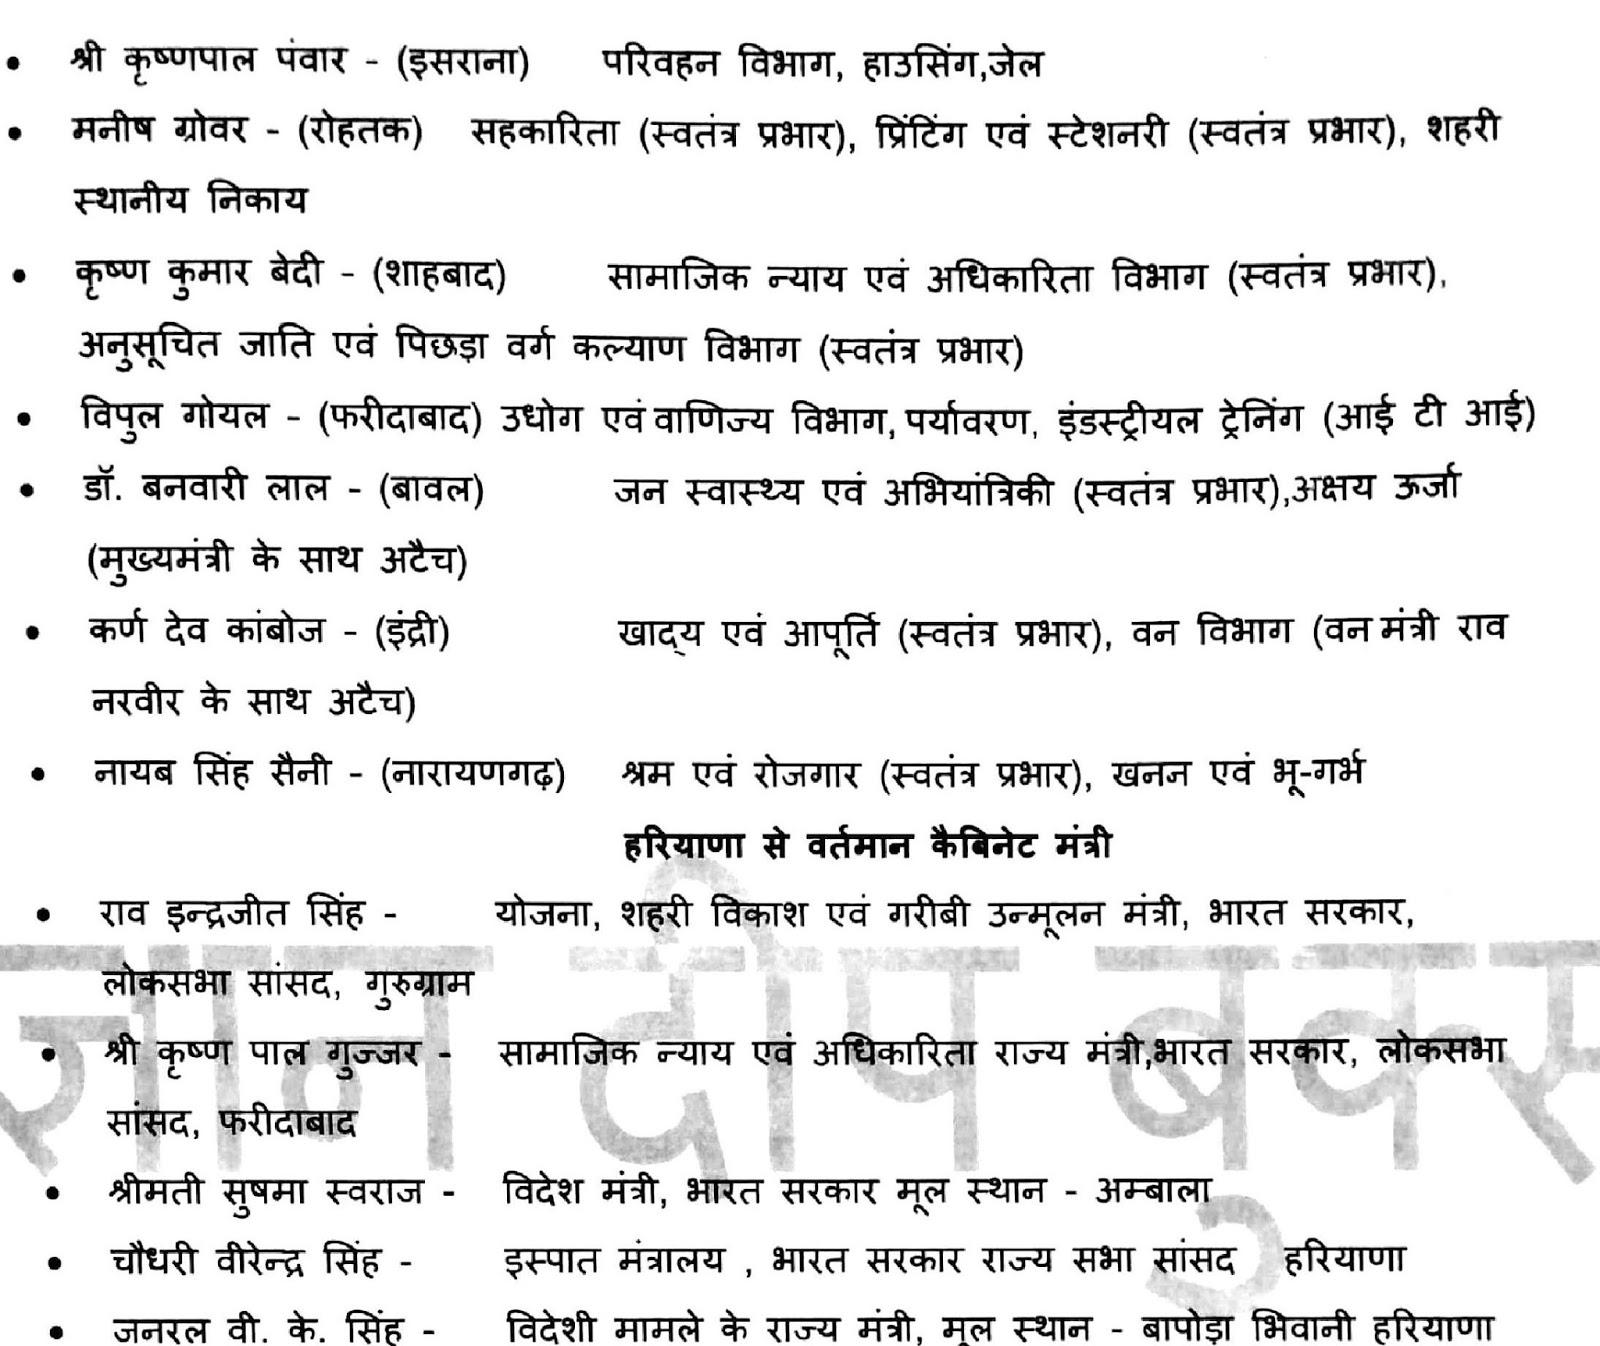 Ha Cur Affairs Pdf Notes In Hindi Gk हर य ण क नय म त र मण डल व उनक ष